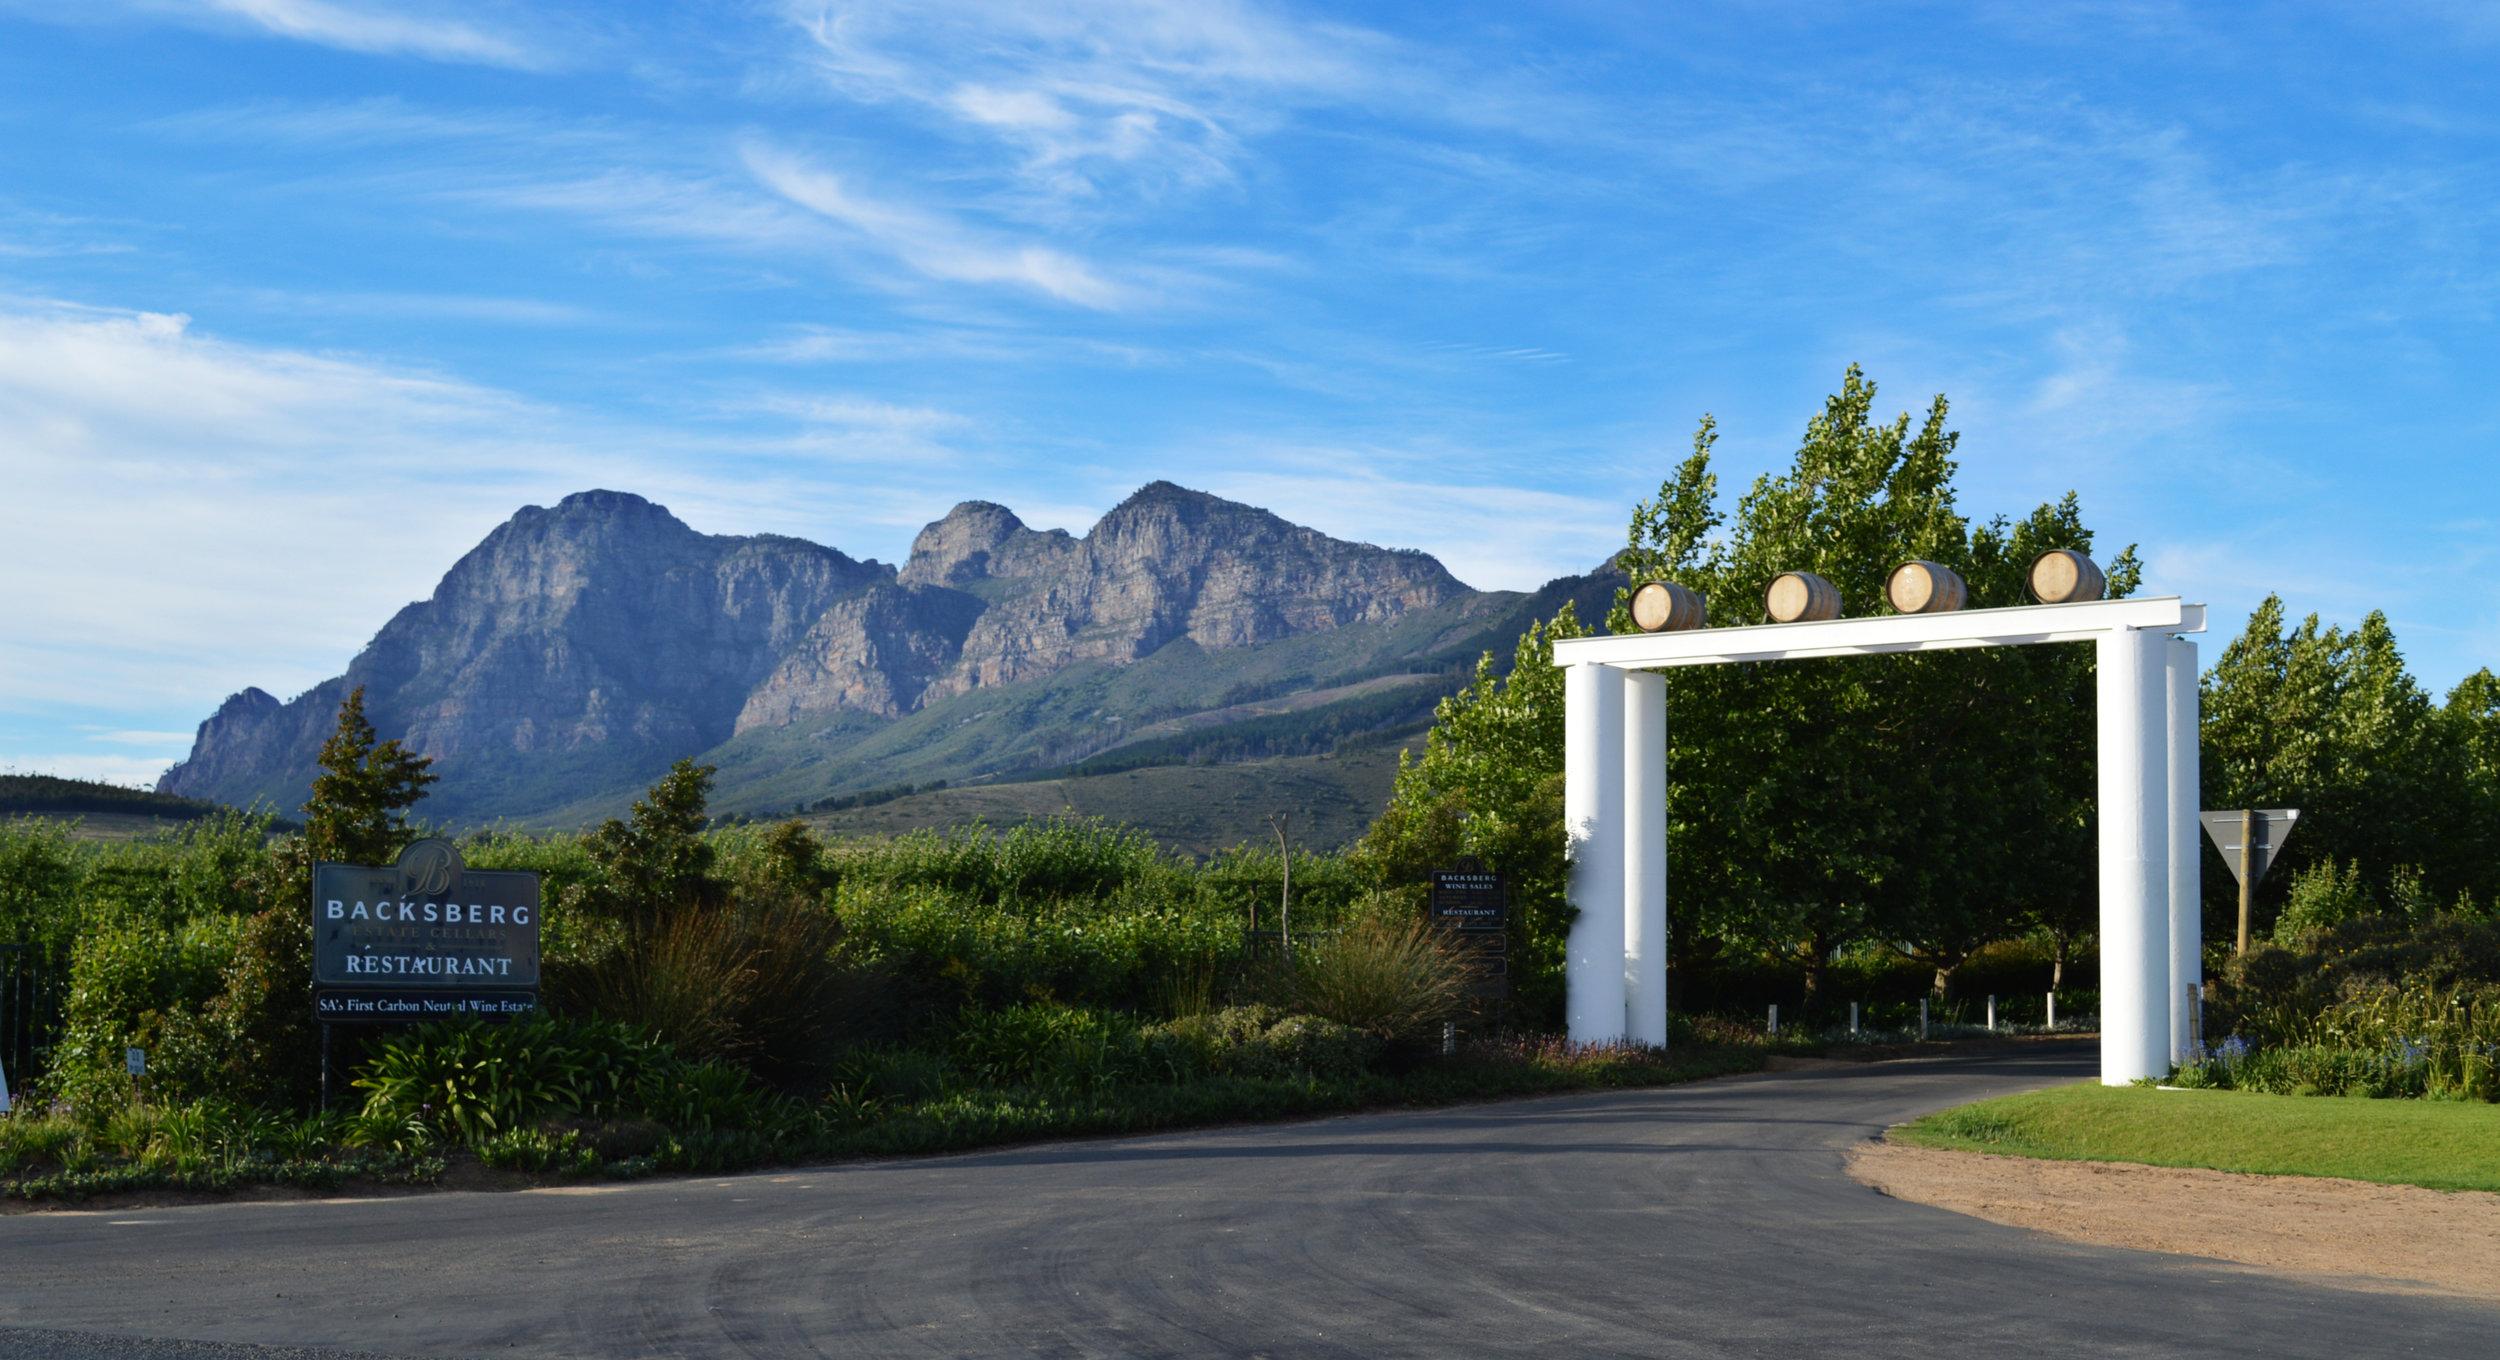 Entrance to Backsberg Cellars, South Africa. Image courtesy of Backsberg Cellars.